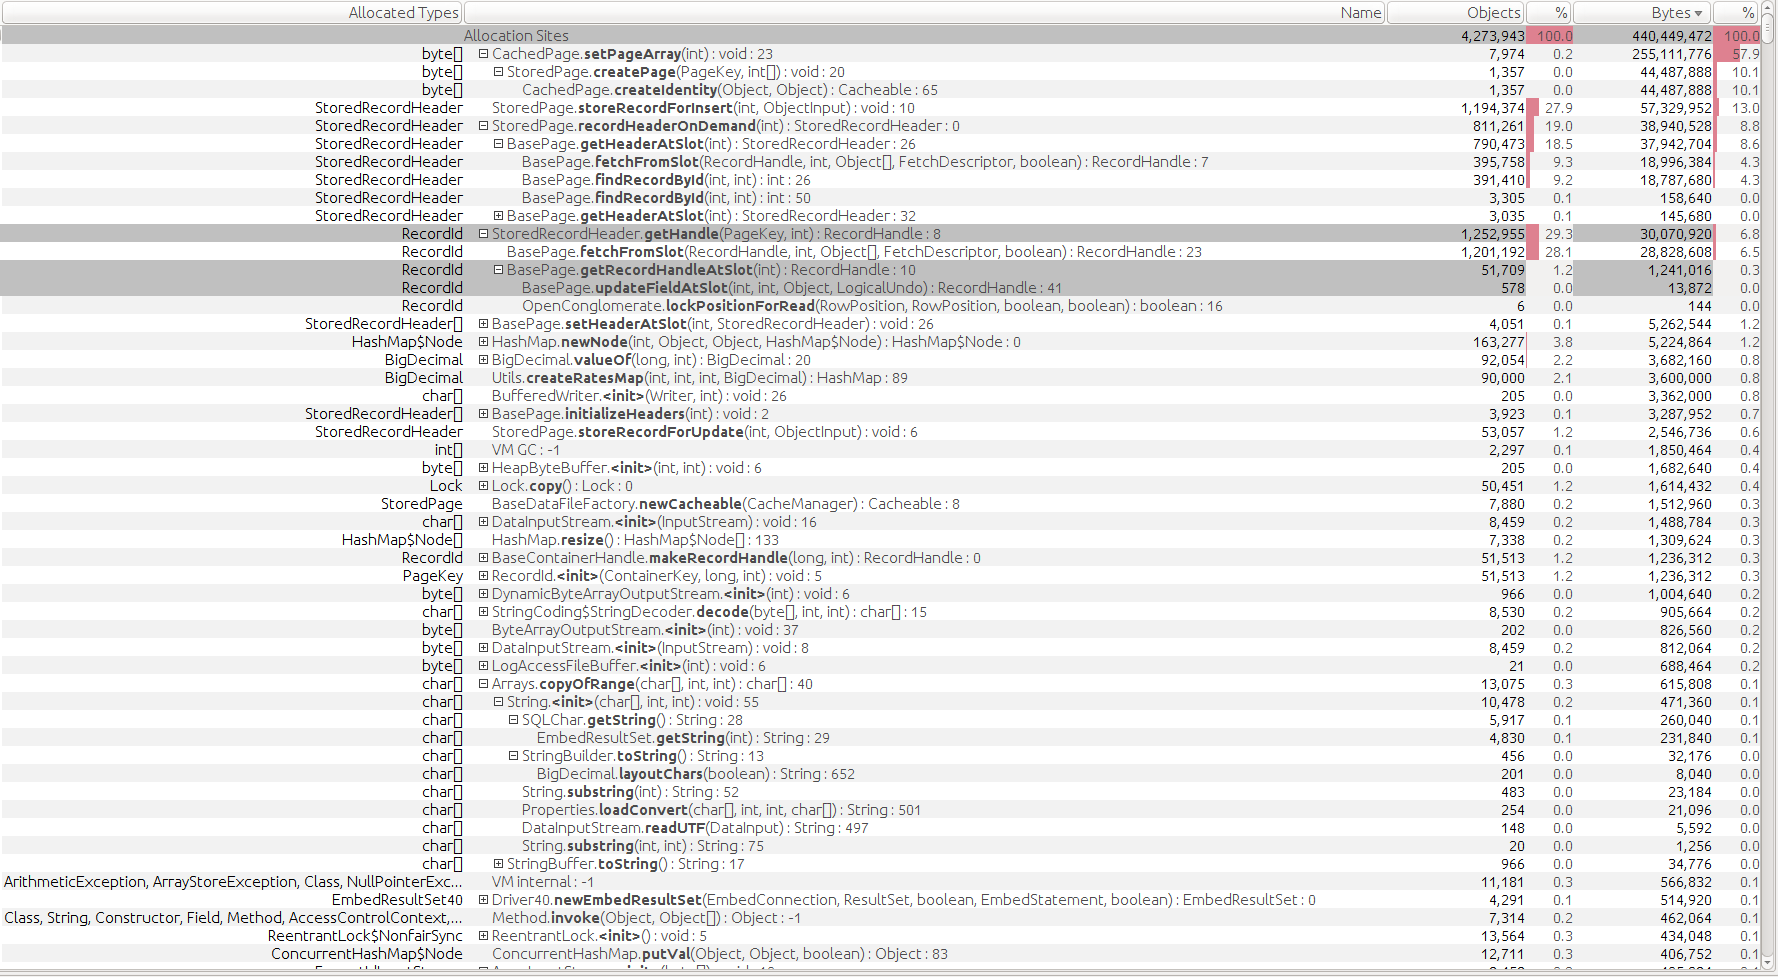 Tool - Allocation Sites